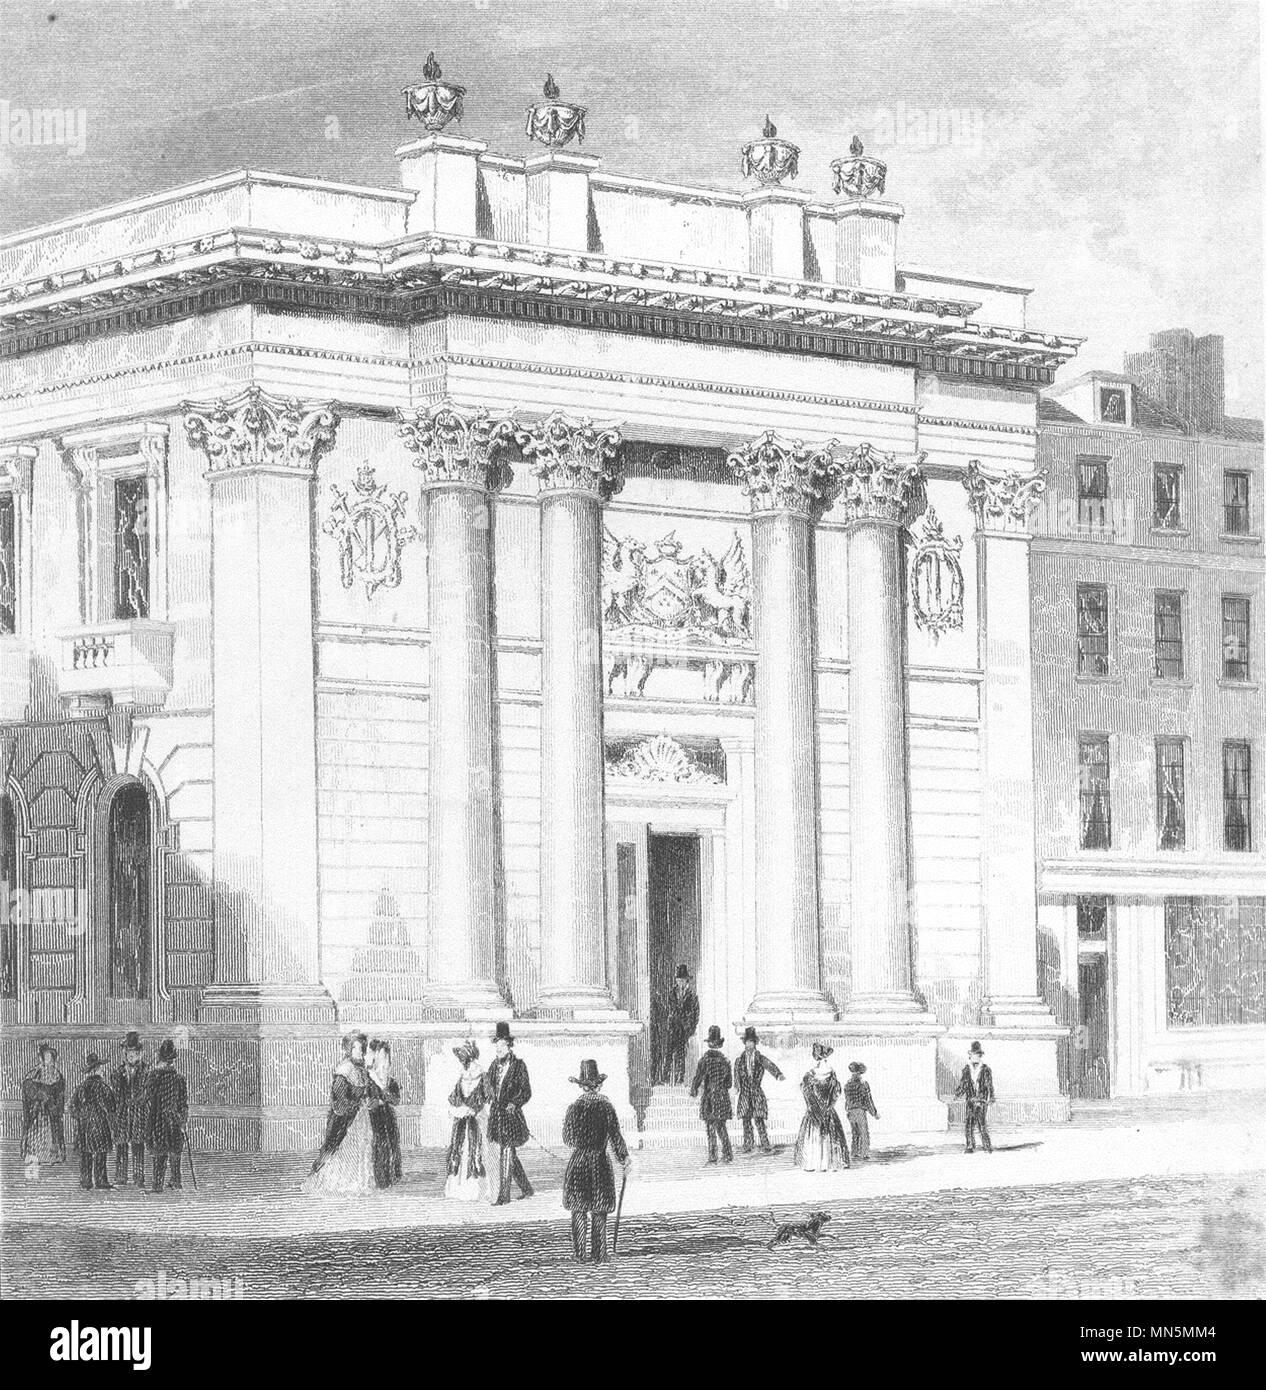 HOLBORN. The new Gresham College. London. DUGDALE c1840 old antique print - Stock Image